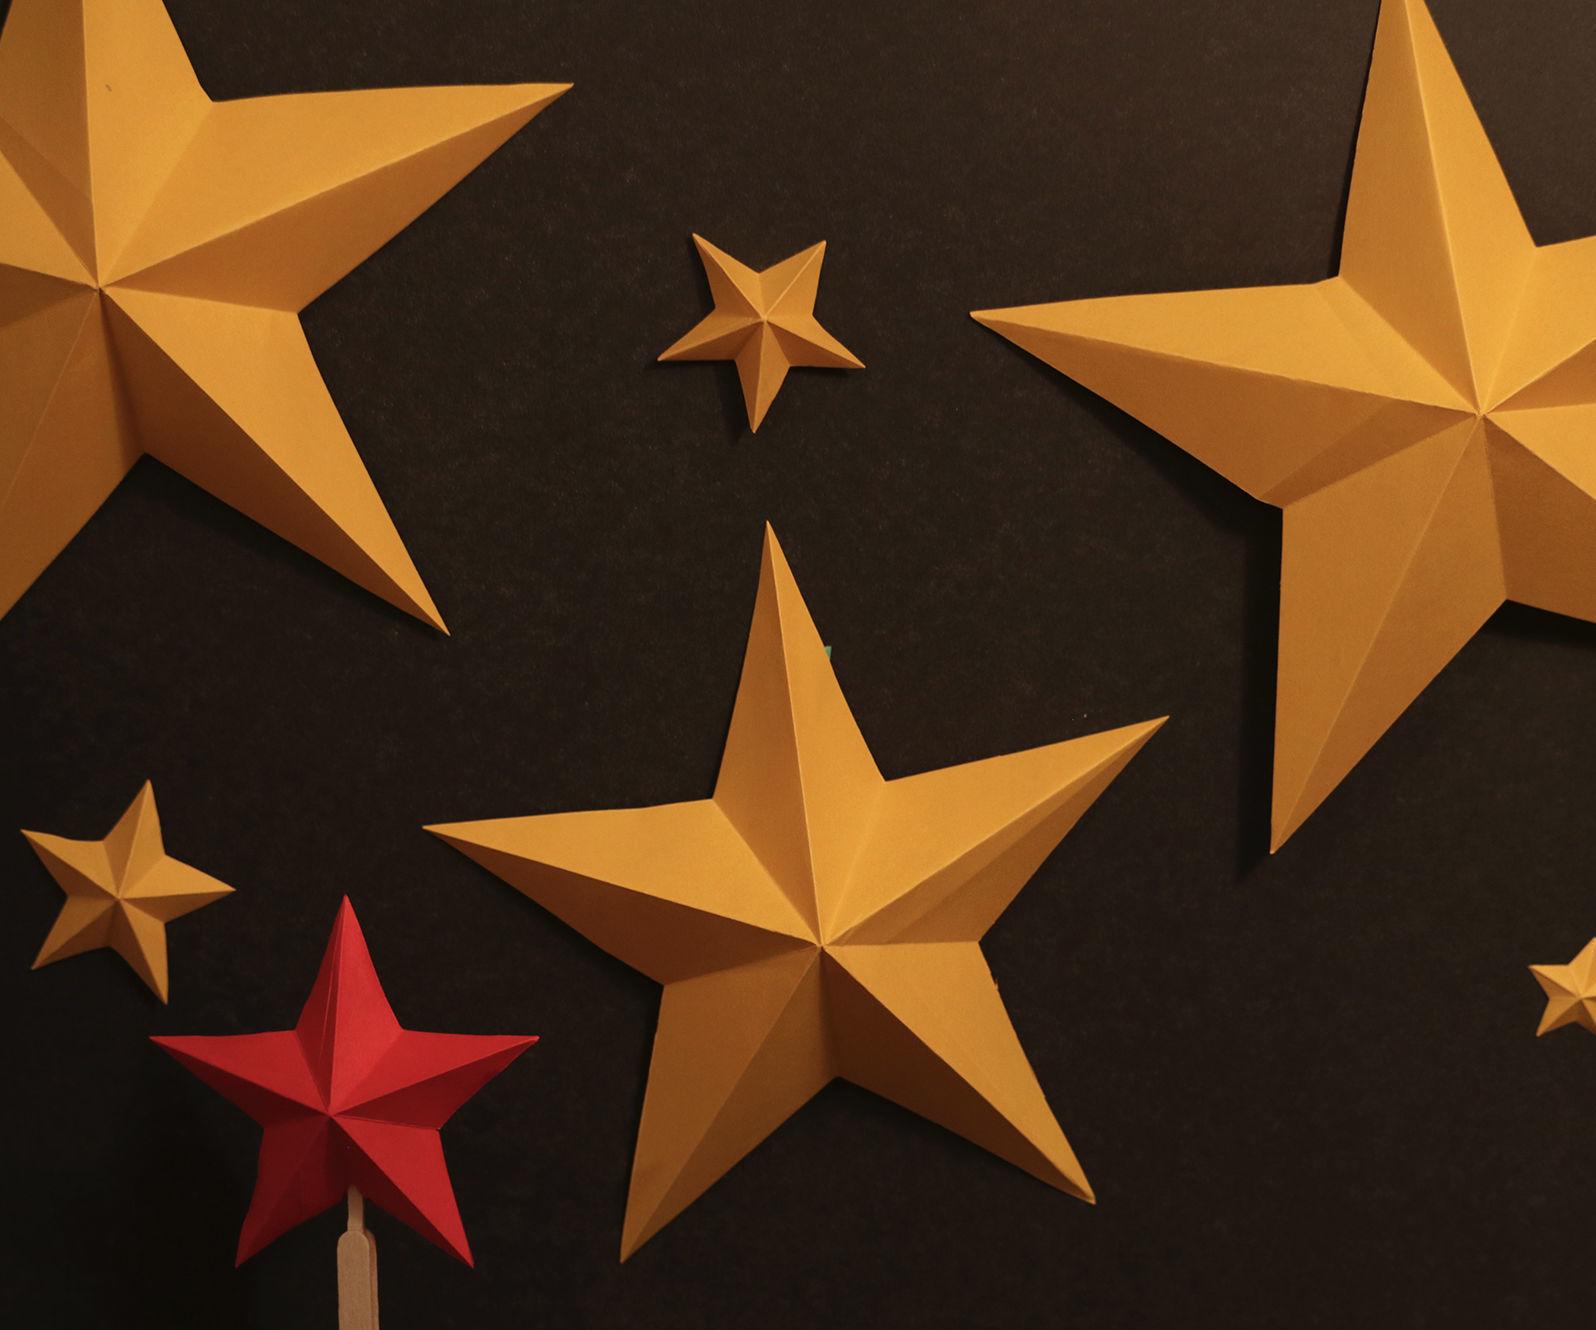 How to Make Simple Kirigami Stars